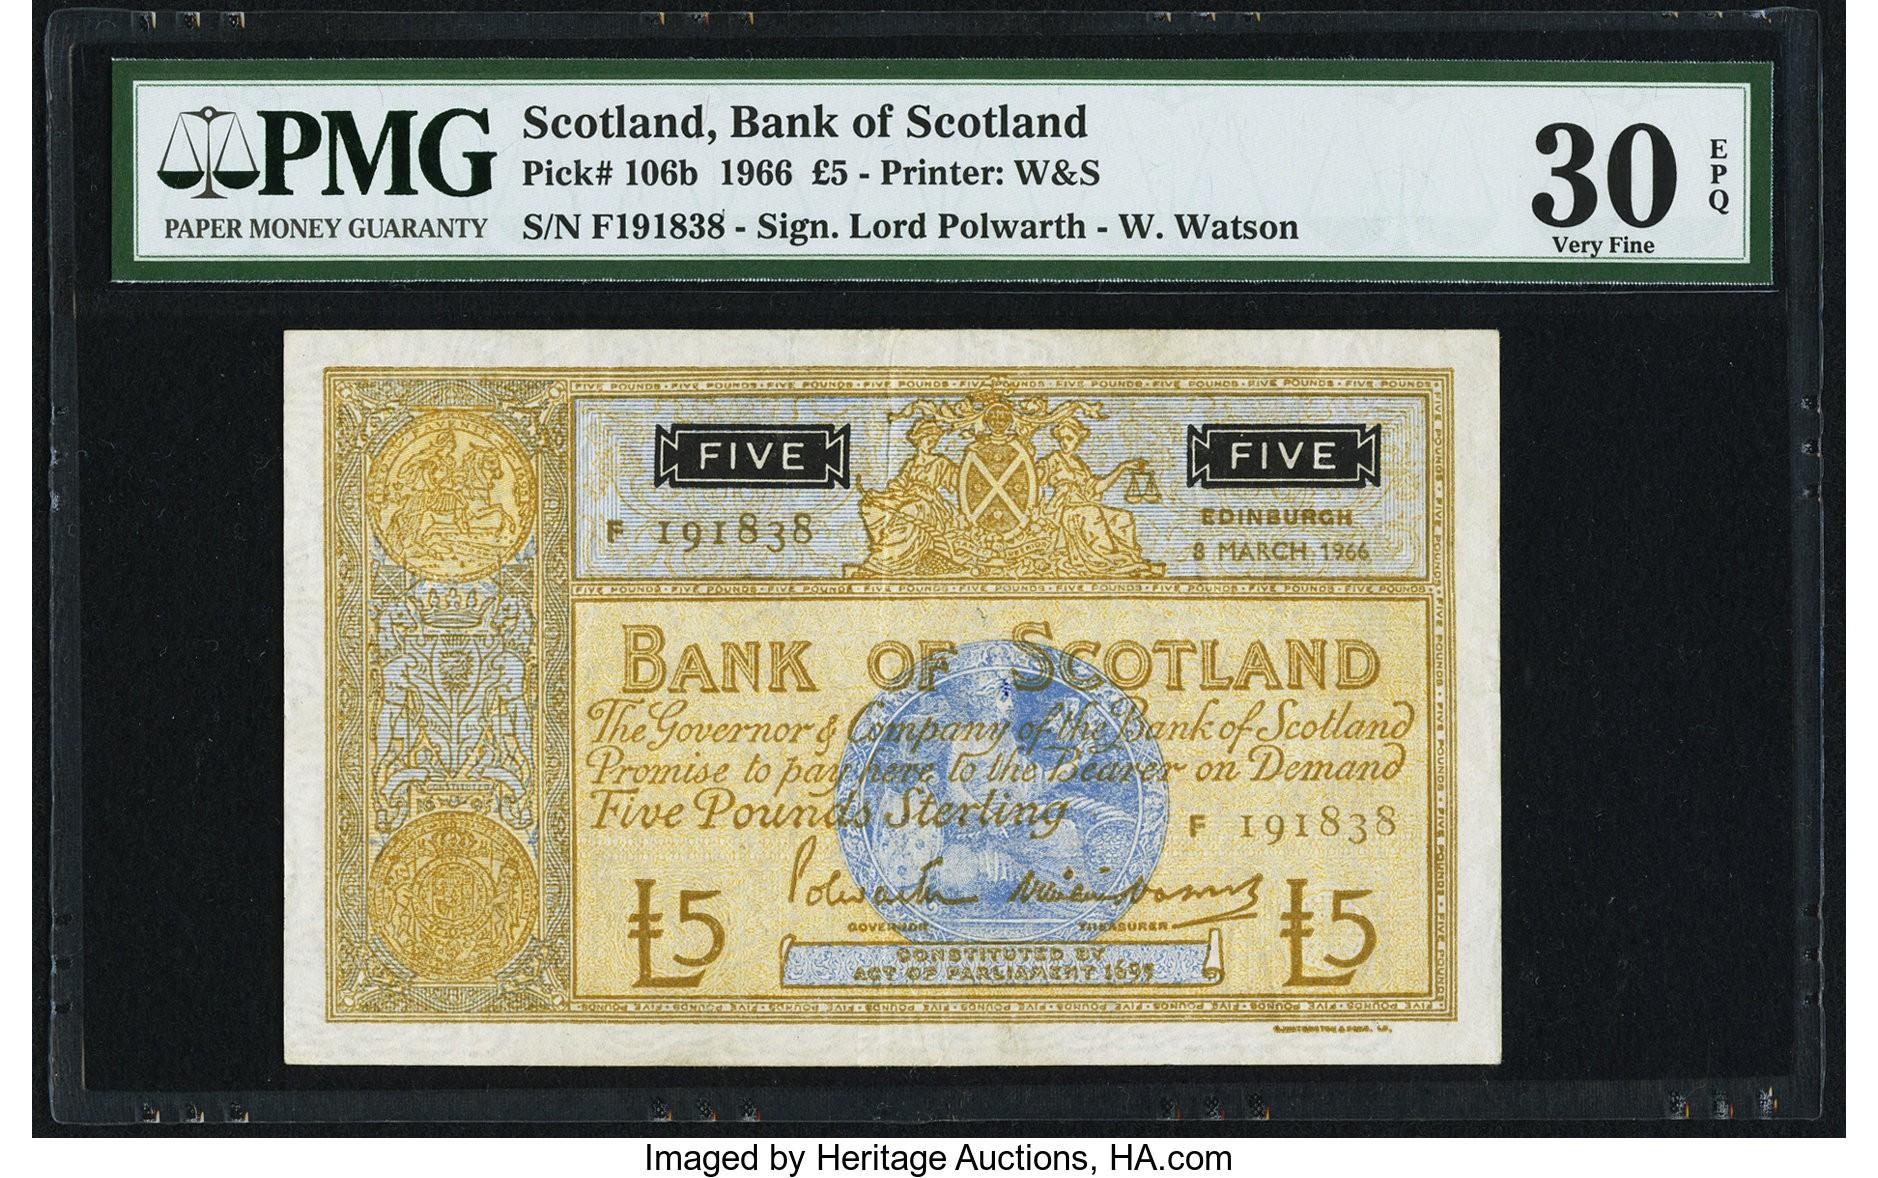 Scotland Bank of Scotland £5 8.3.1966 Pick 106b PMG Very Fine 30 EPQ o.jpg